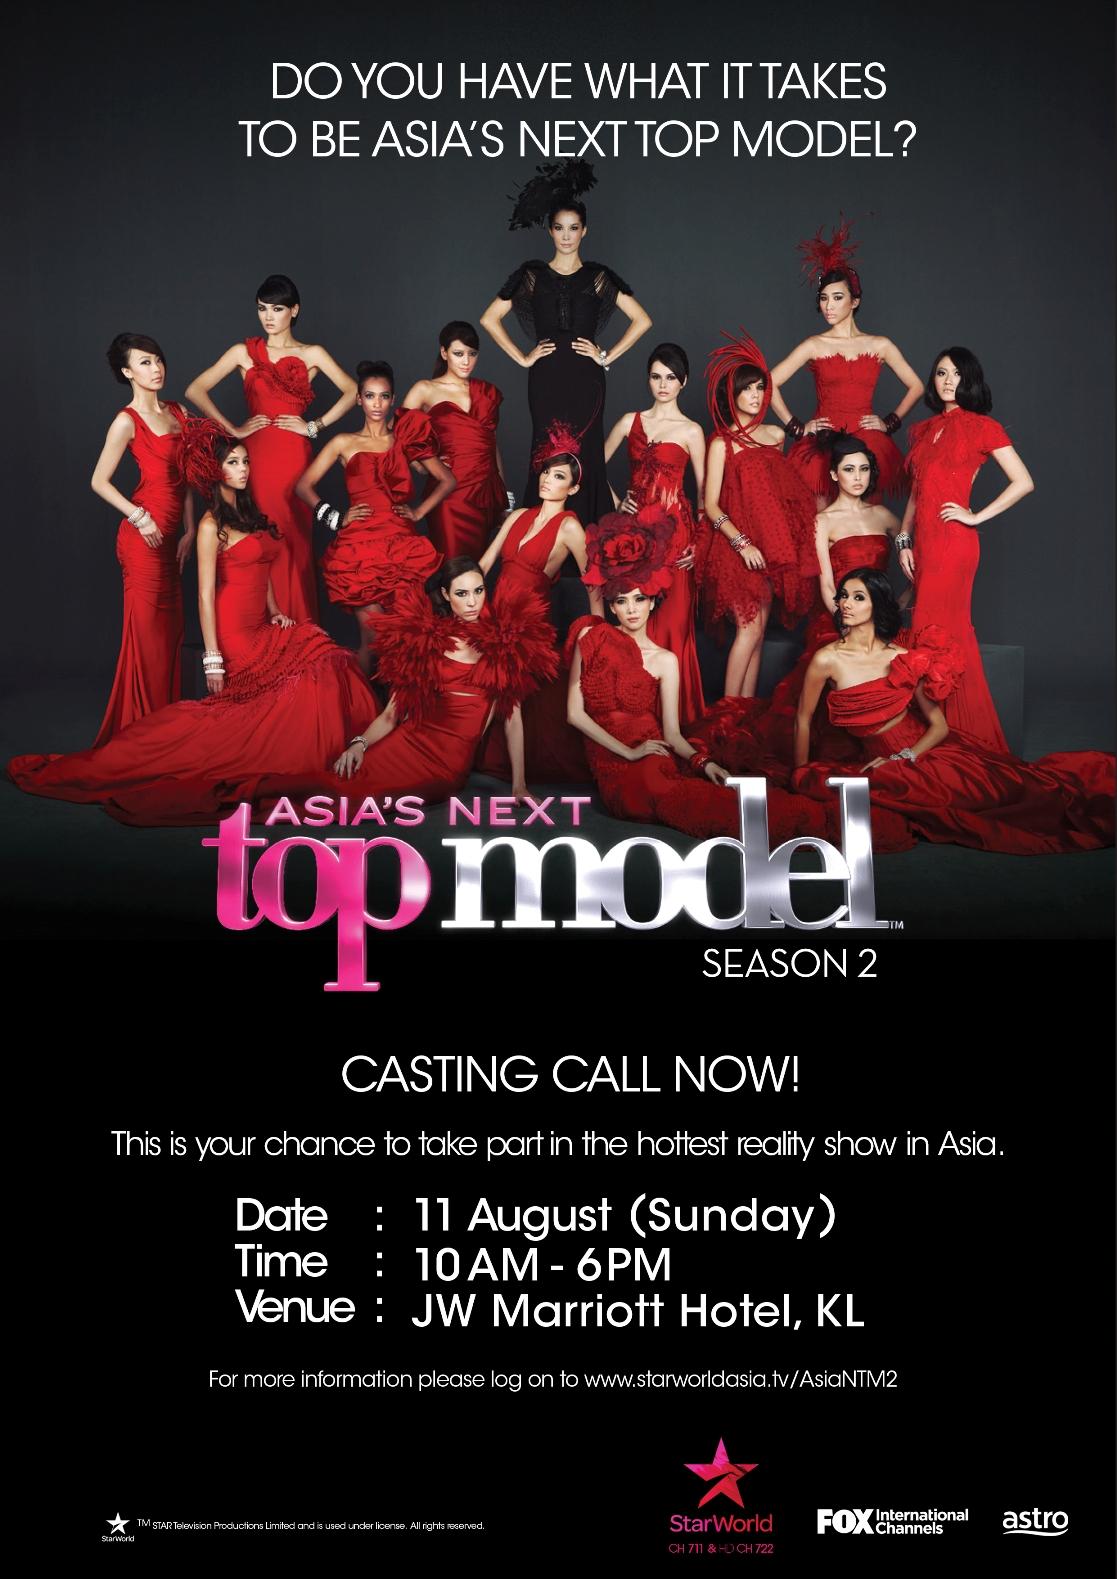 Asia's Next Top Model Season 2